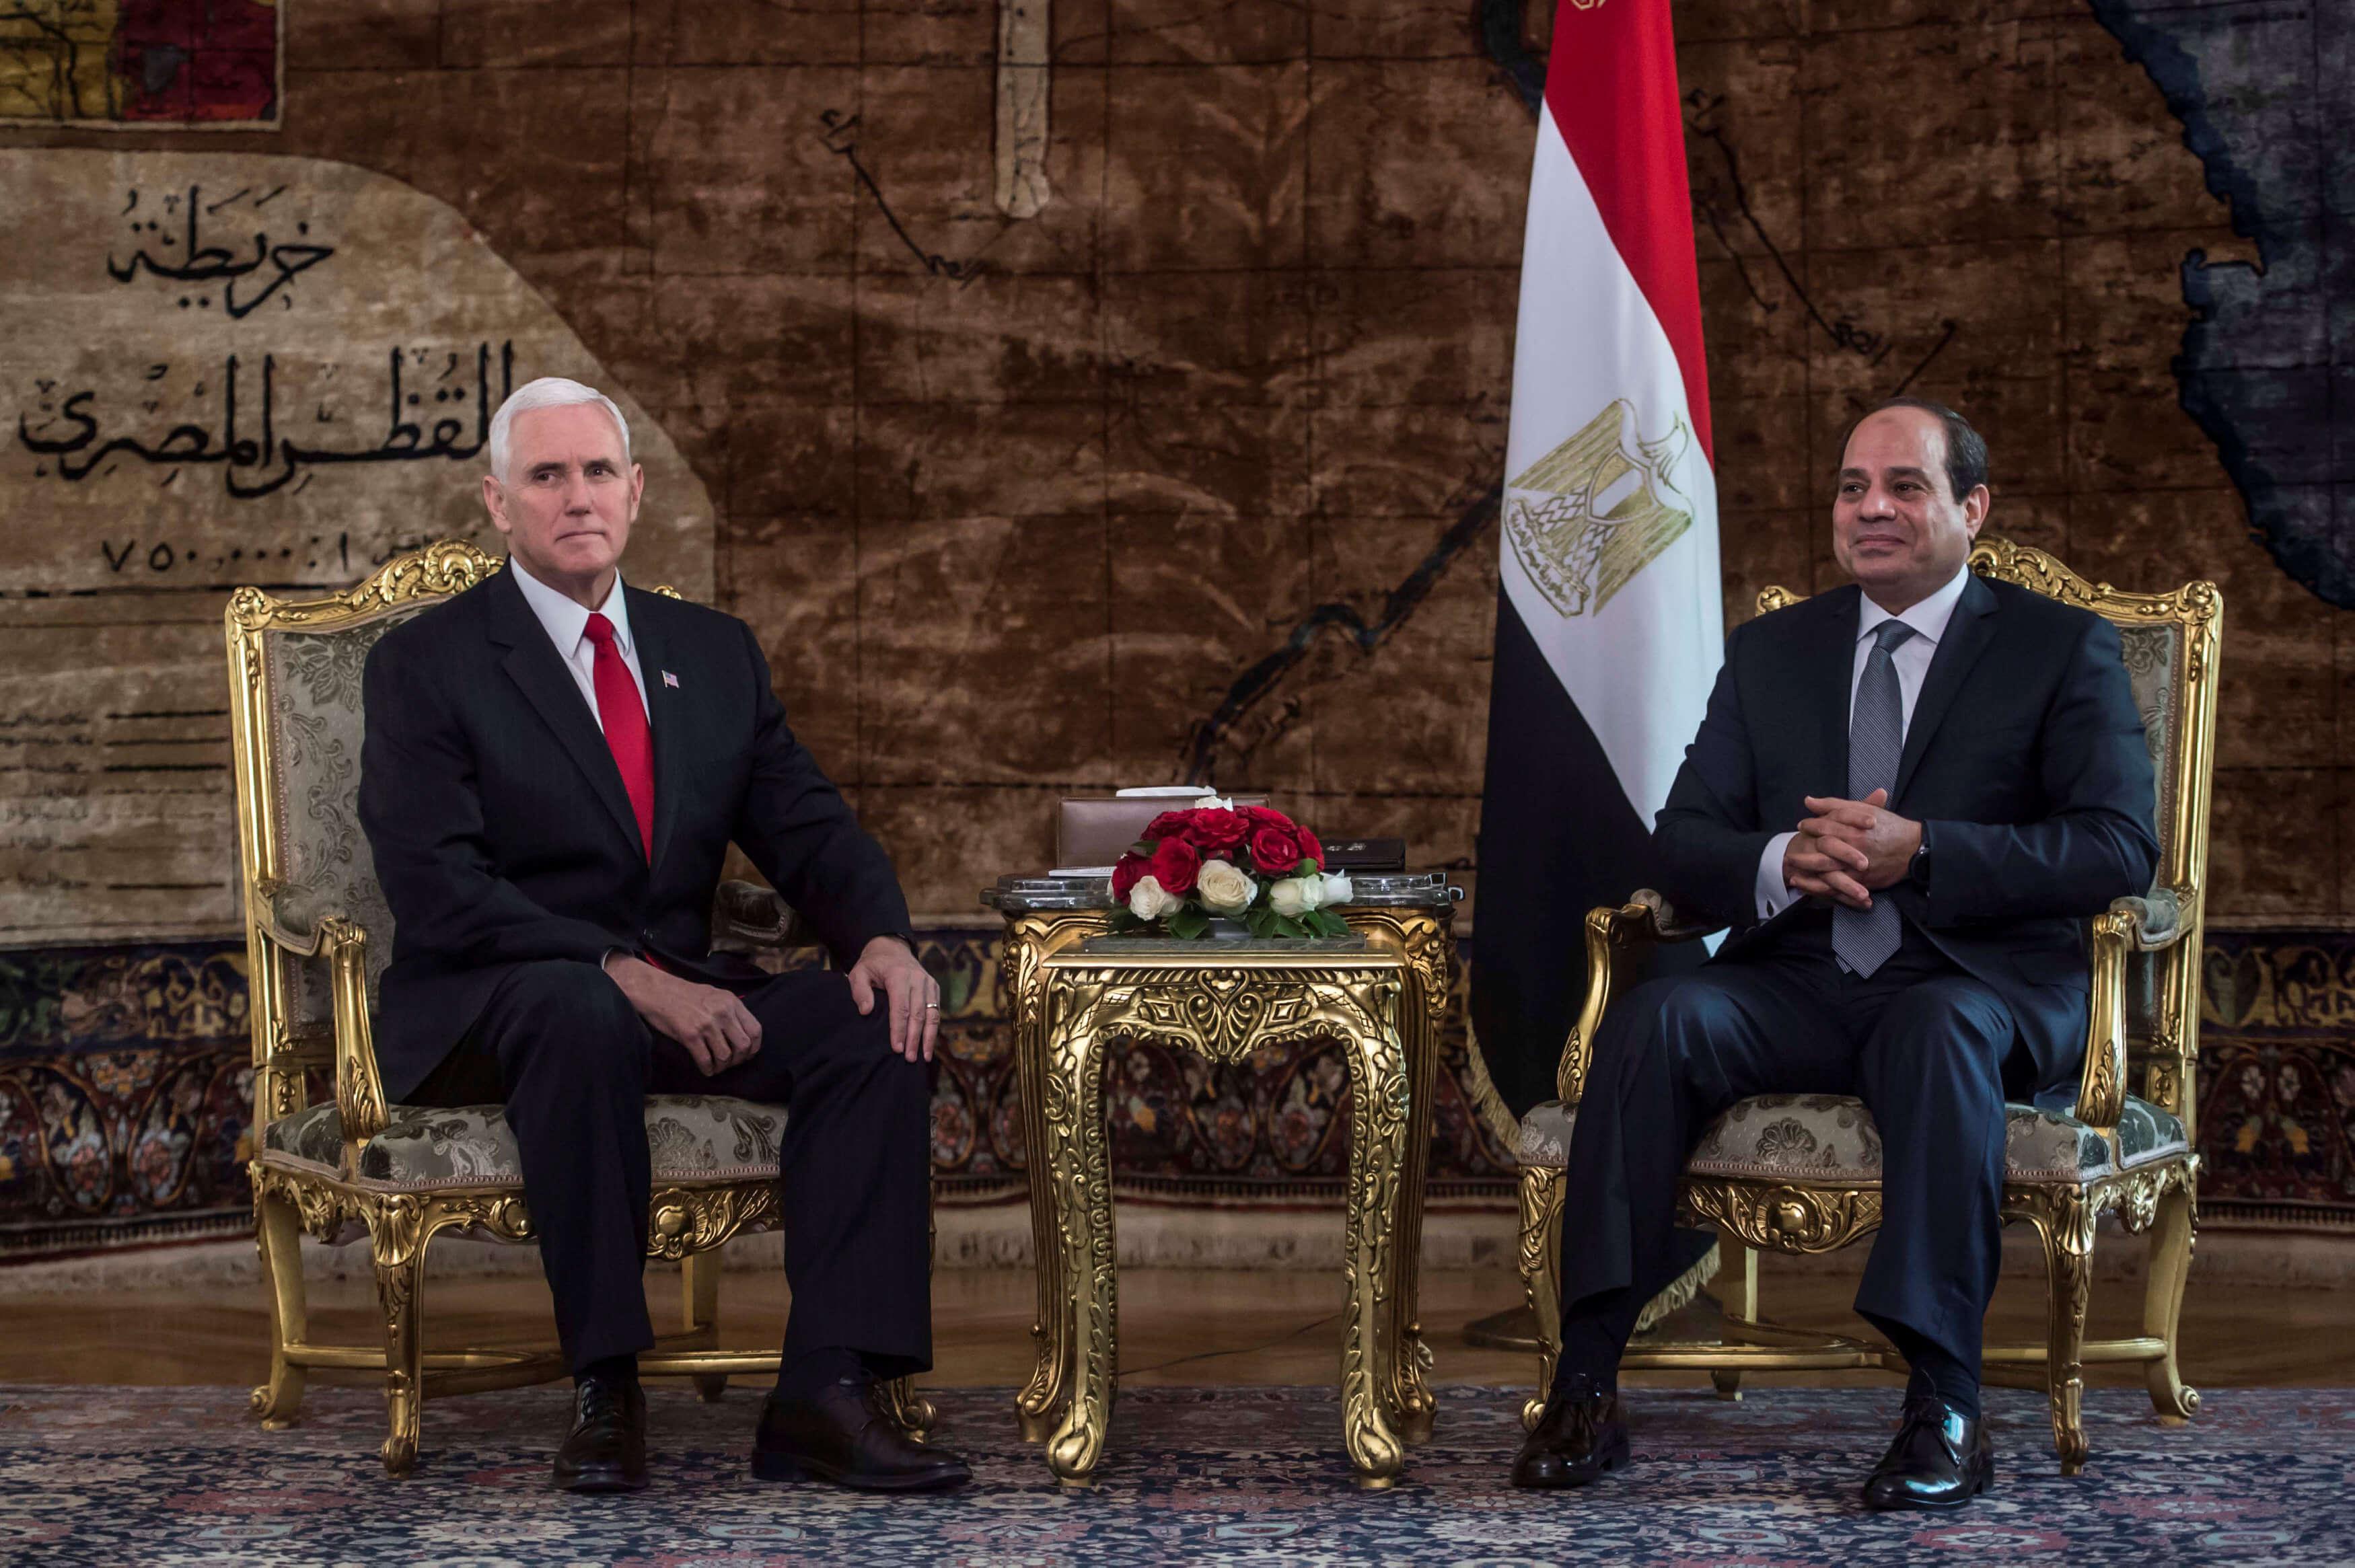 Gira de Pence en Oriente Medio está bajo tensión